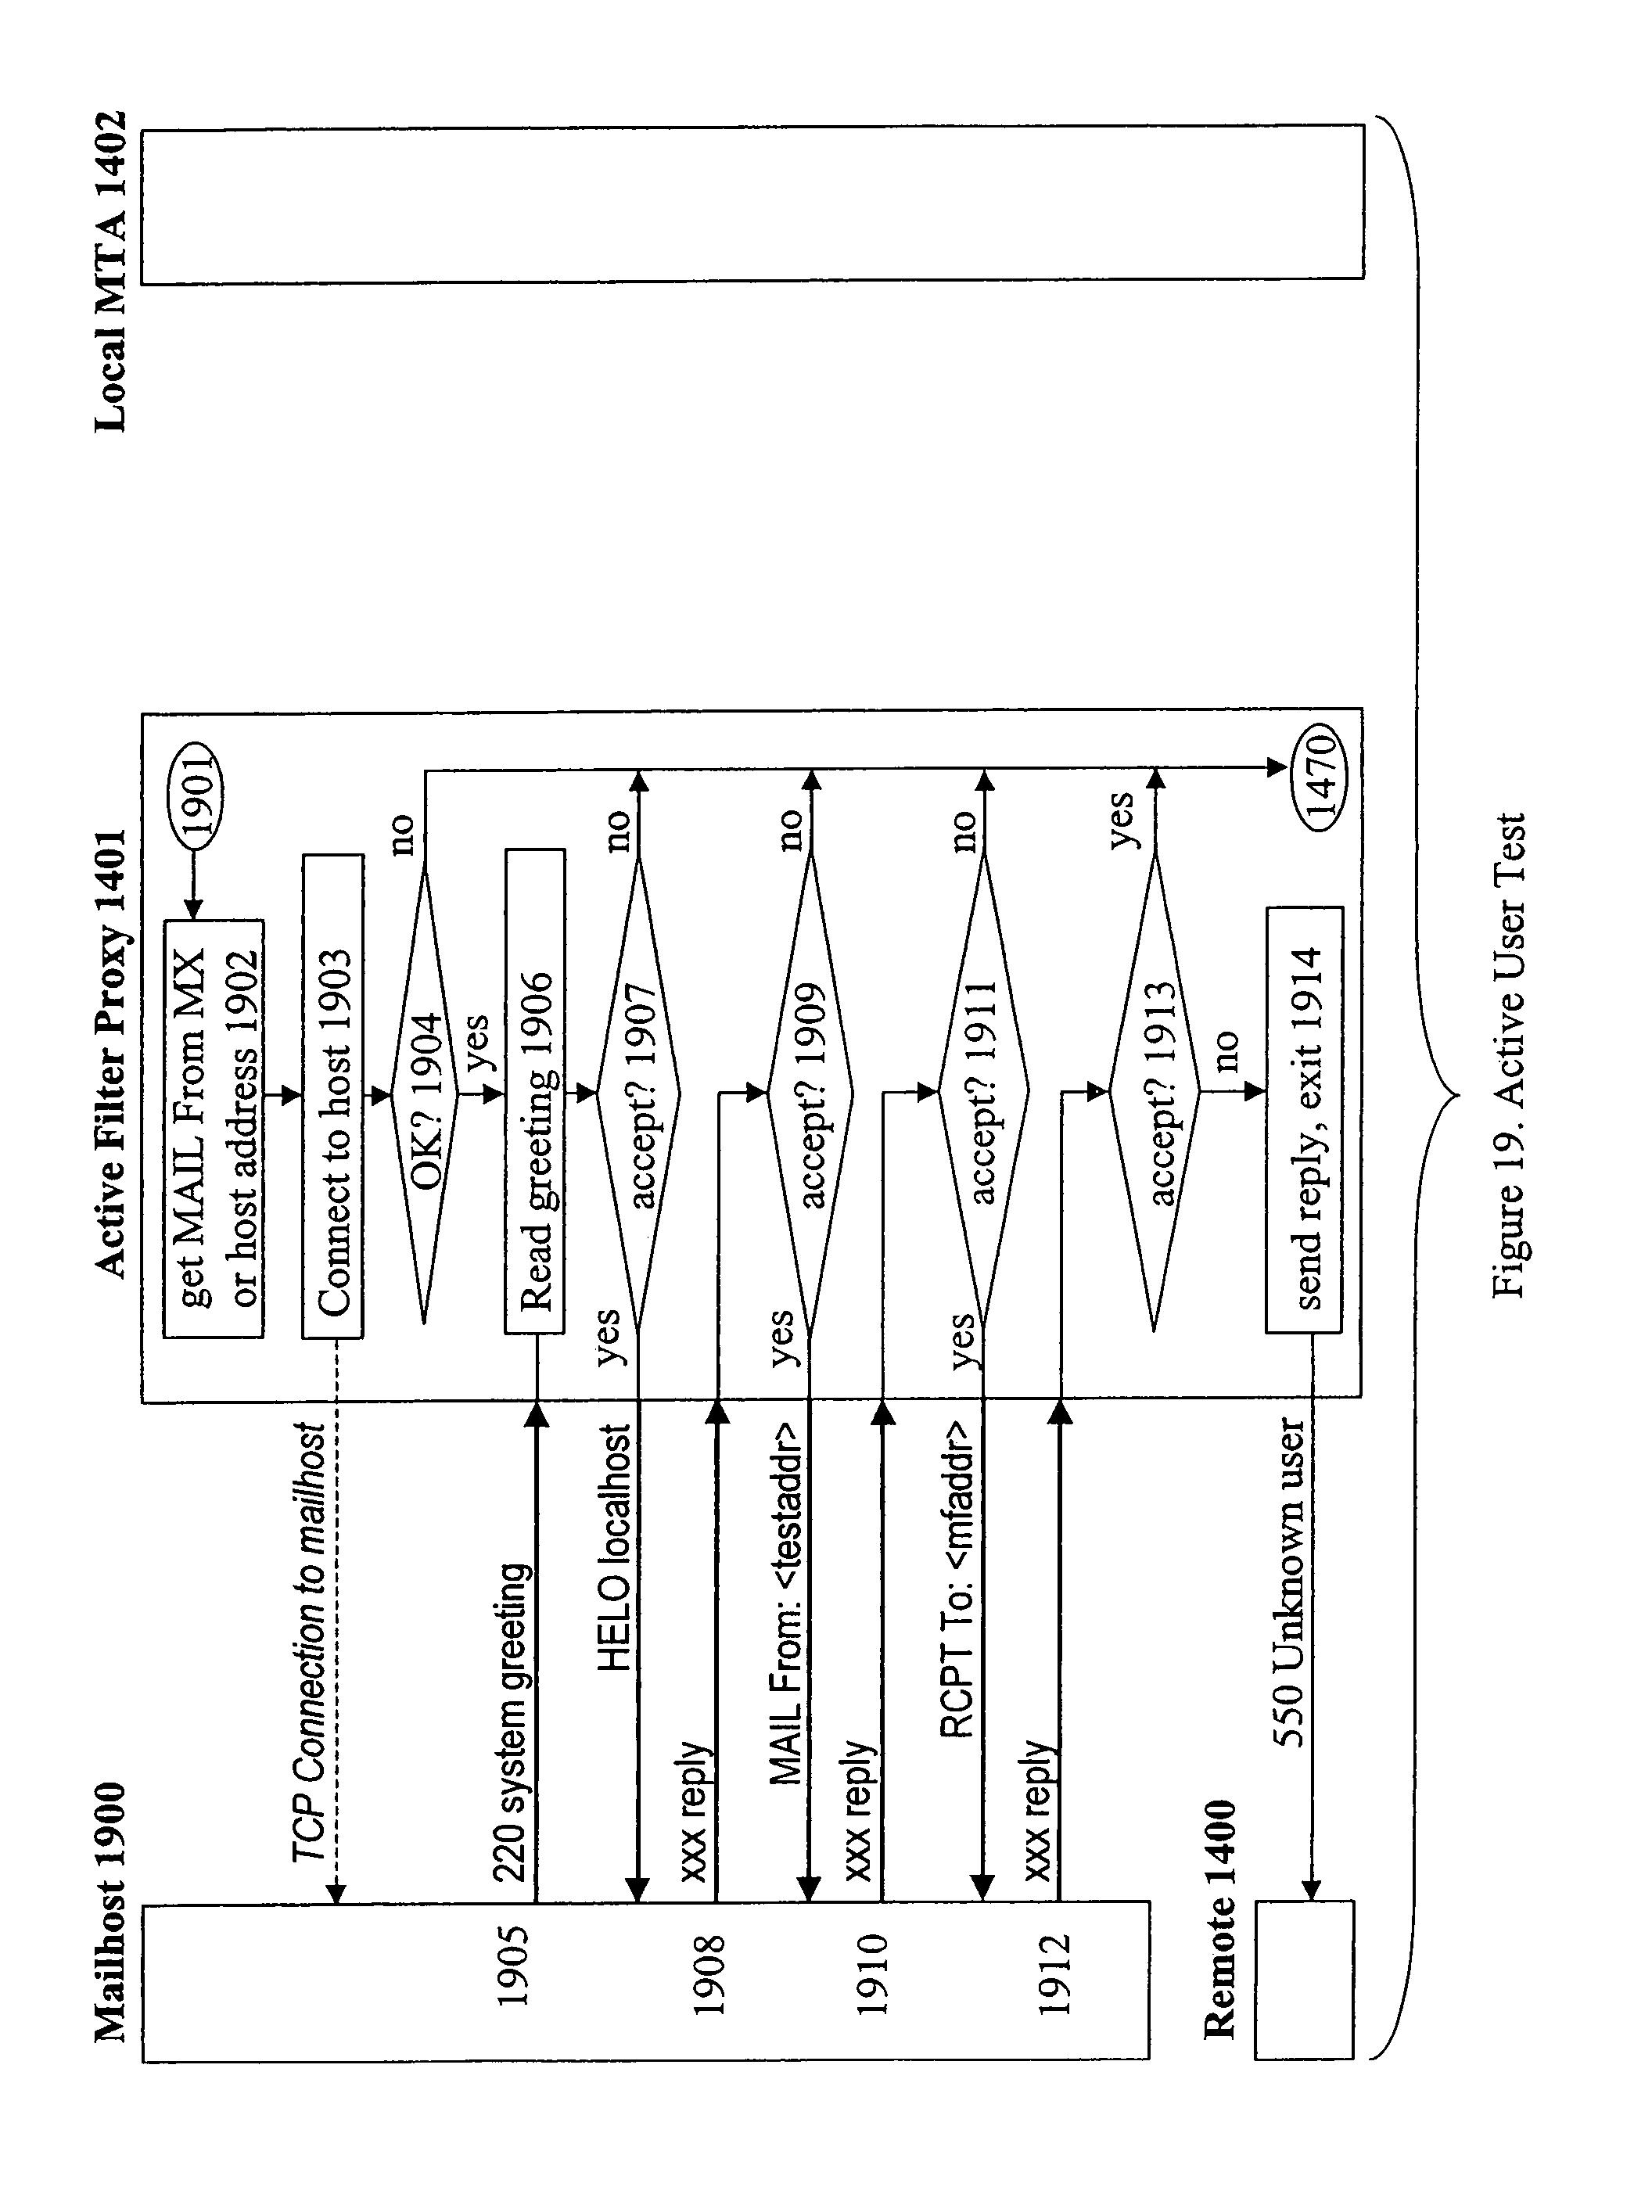 Patent US 7,249,175 B1